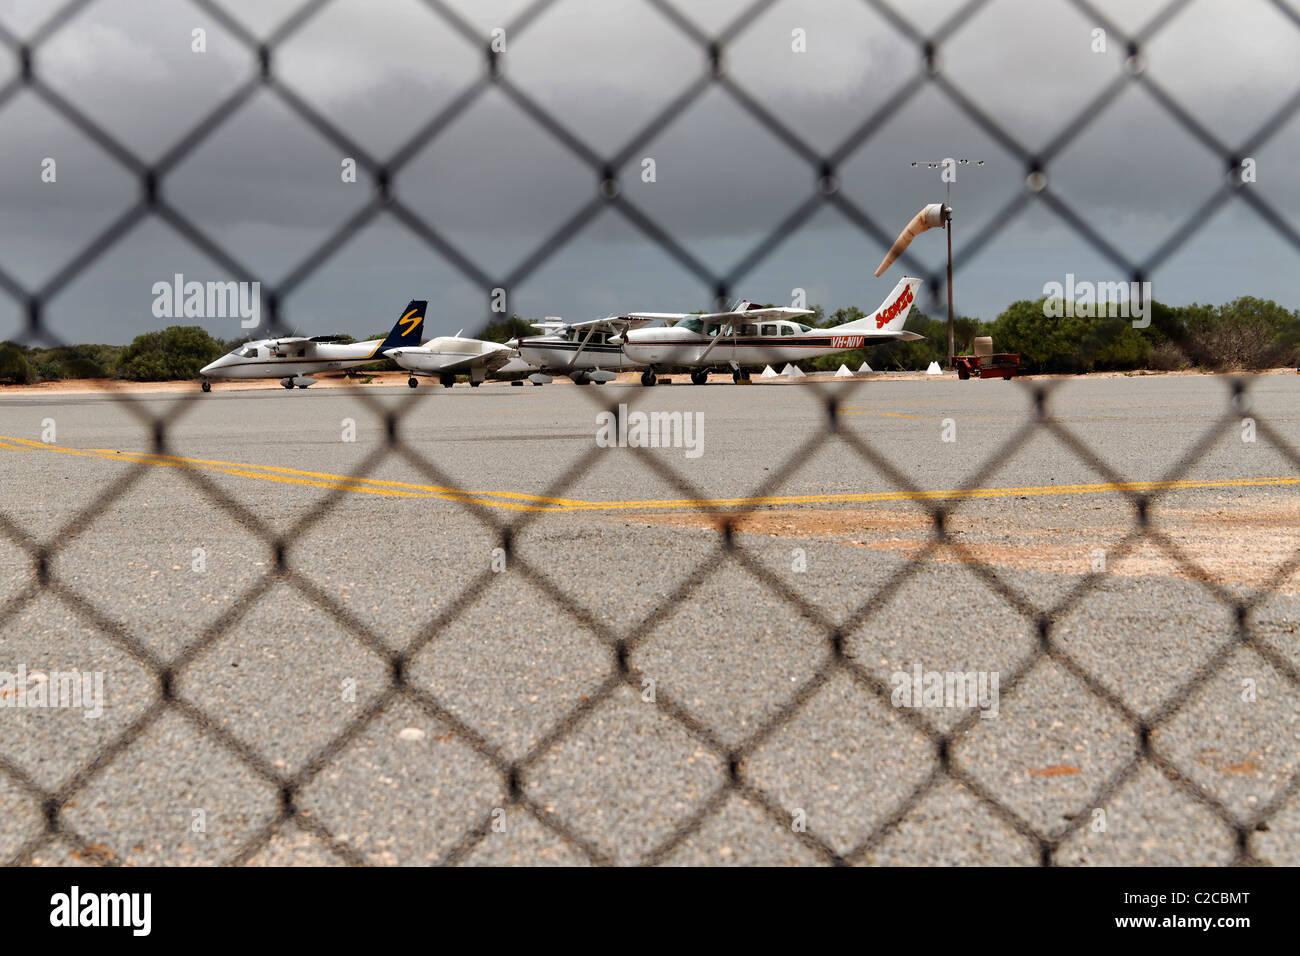 Light aircraft seen through wire fence at Denham airport, Shark Bay, Northwest Australia - Stock Image